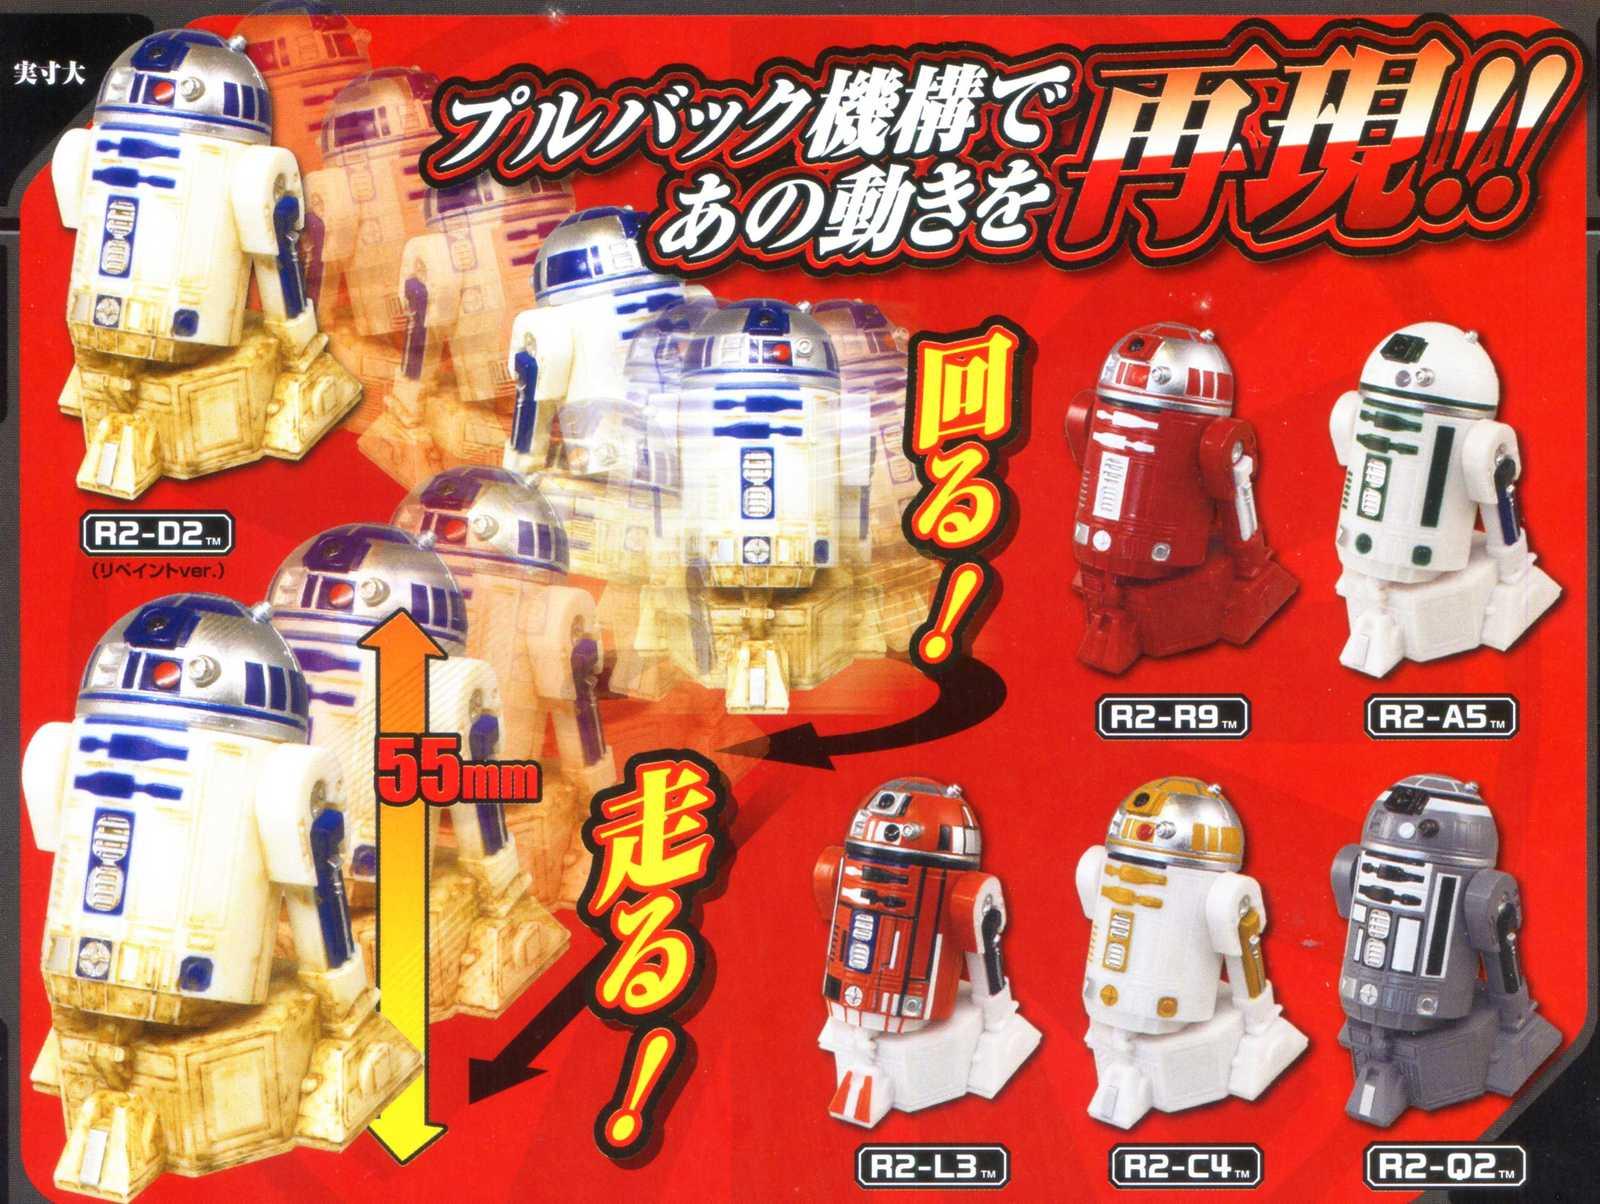 TAKARA TOMY ARTS STAR WARS Characters GACHA GALAXY PULLBACK DROID Phase 2 R2-C4